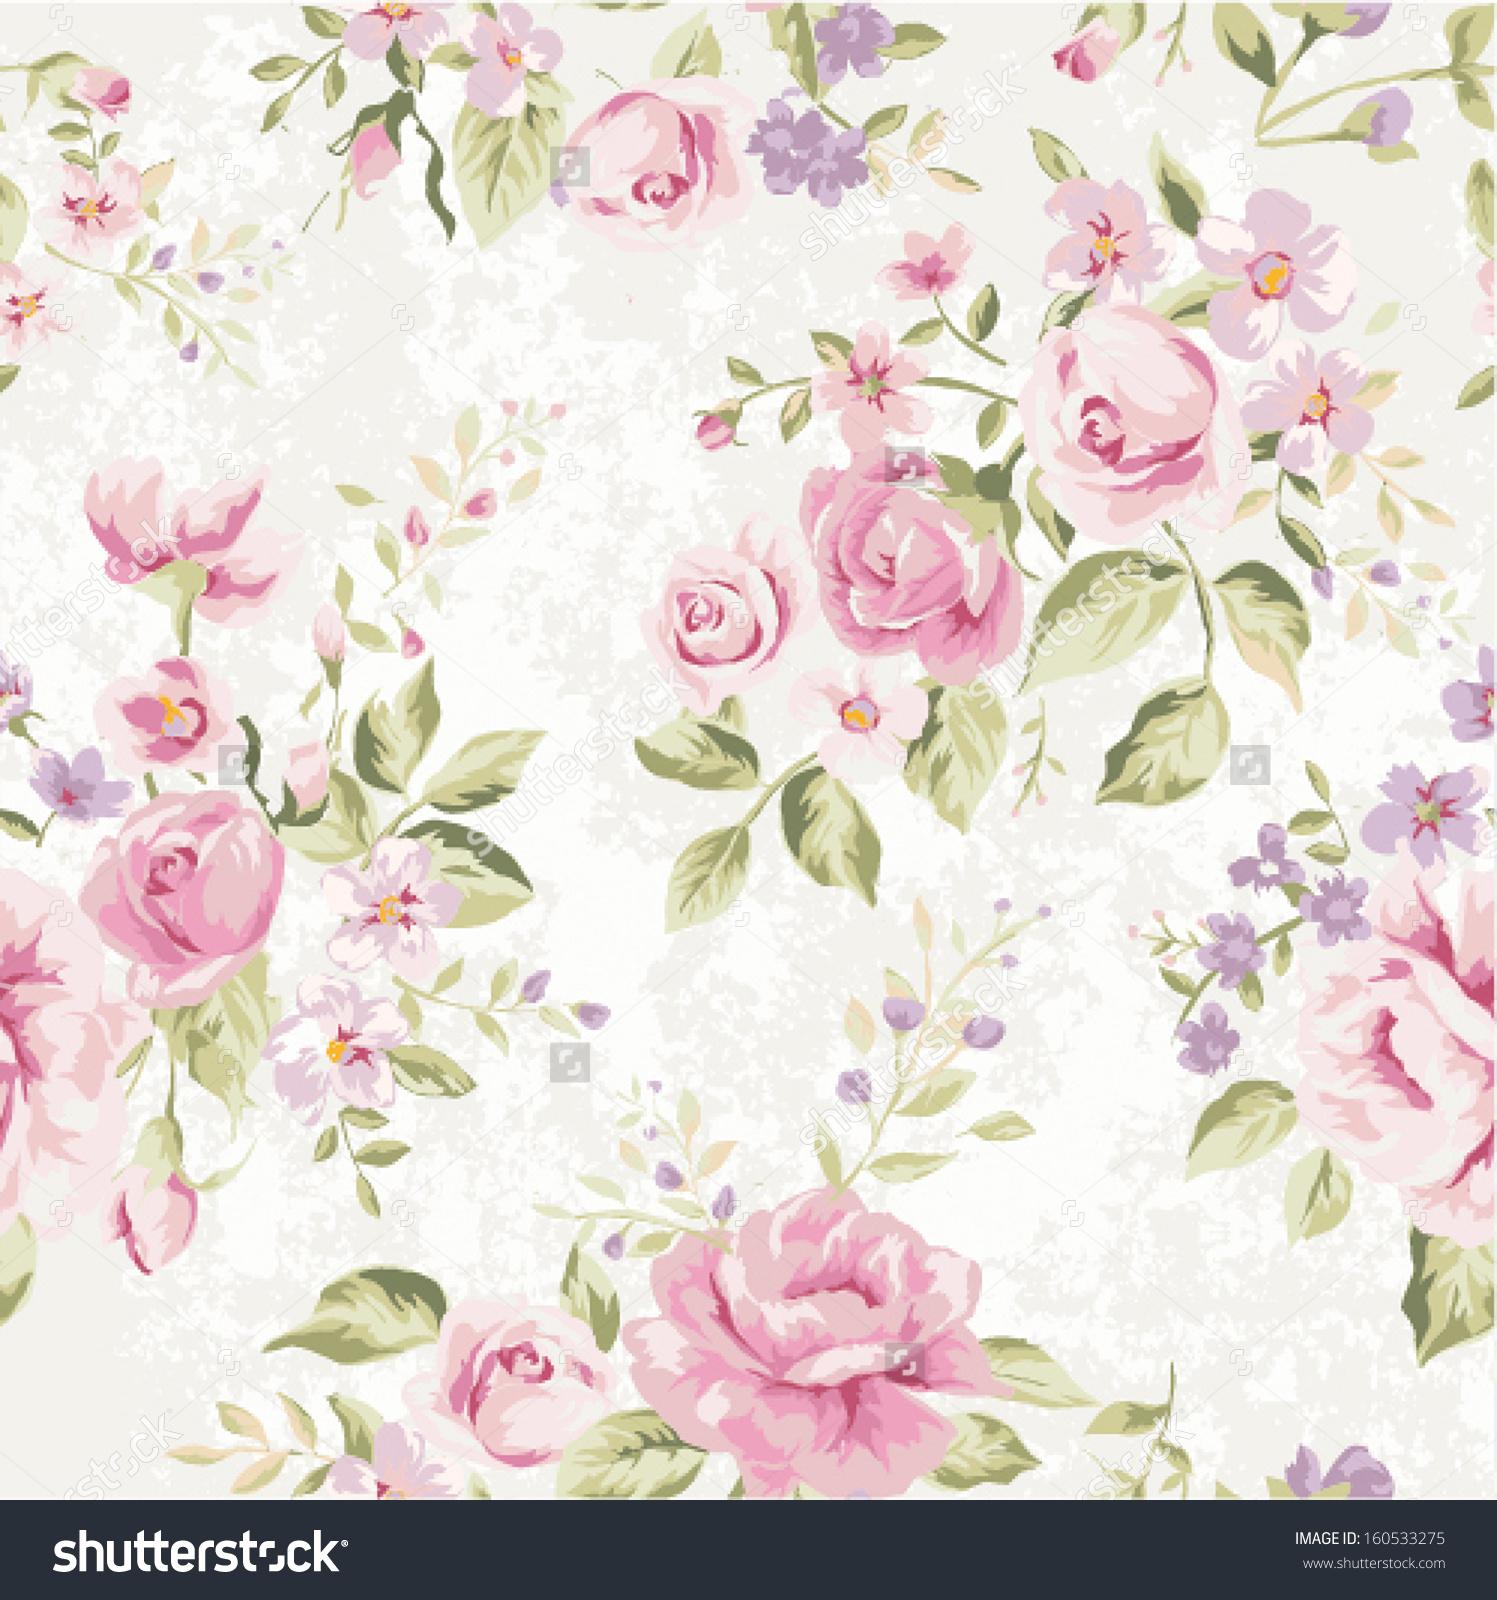 Vintage Flower clipart background Wallpaper vintage stock classic classic